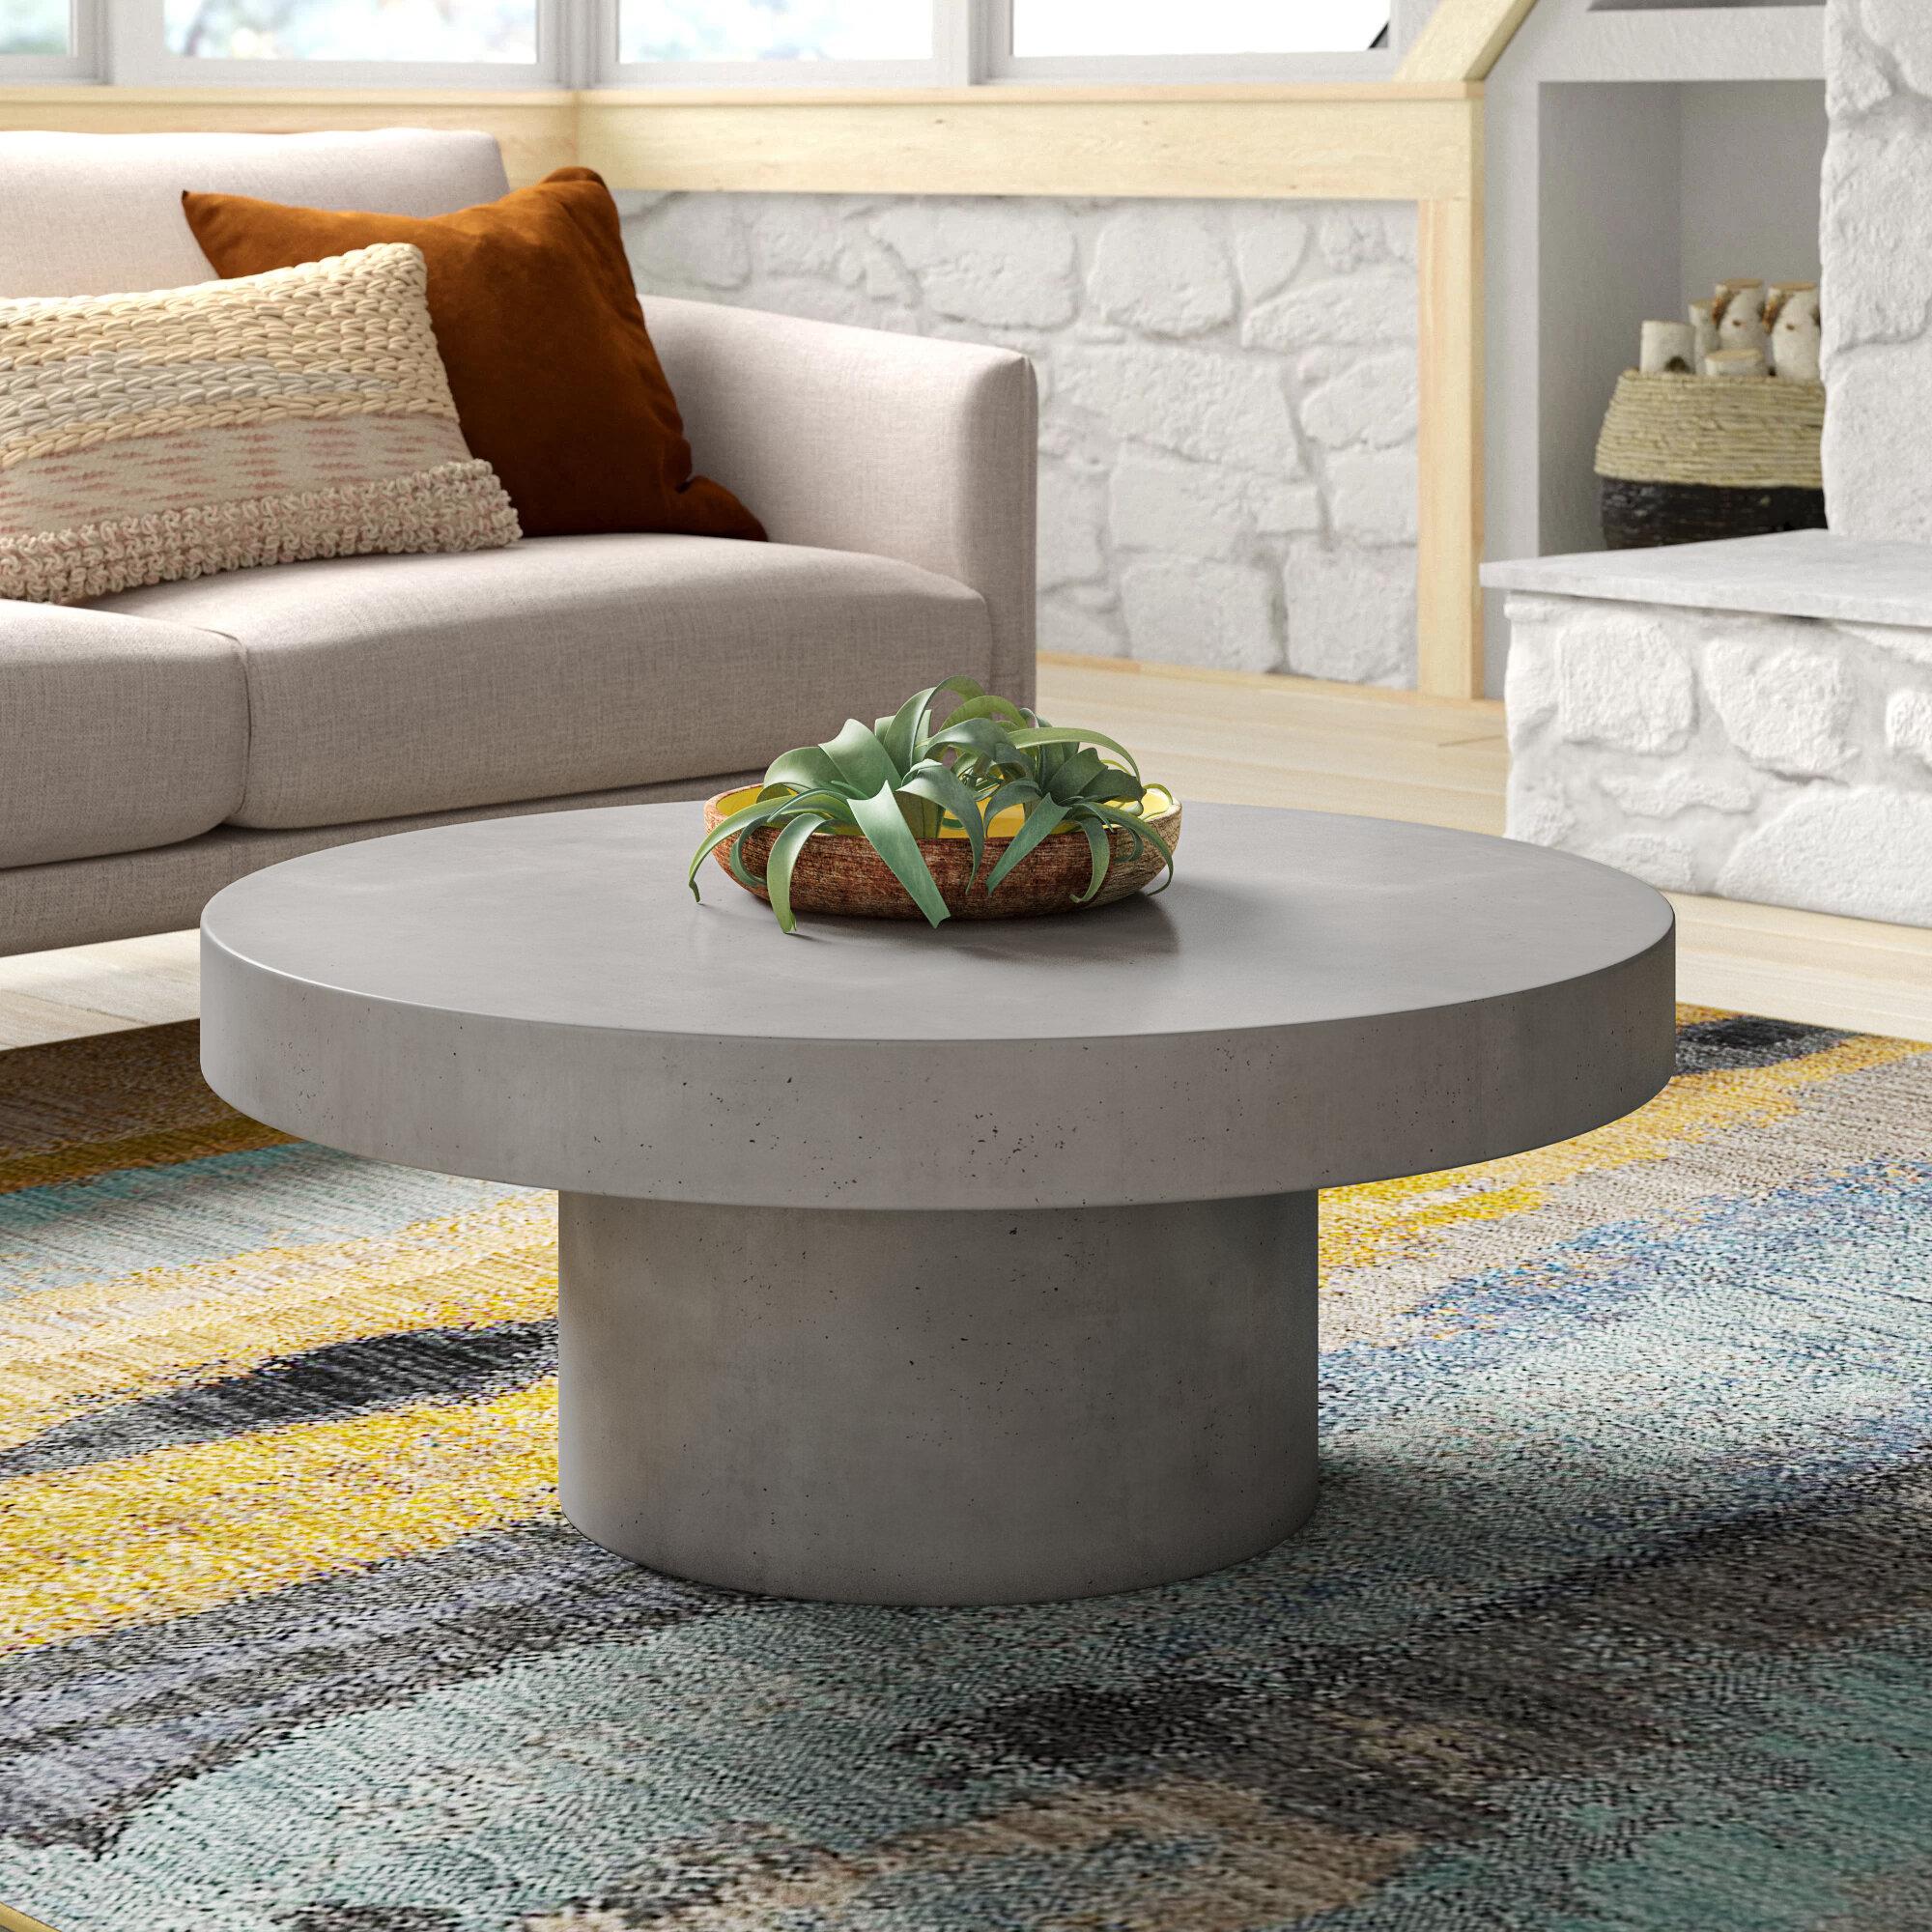 Guliana Drum Coffee Table Reviews Allmodern